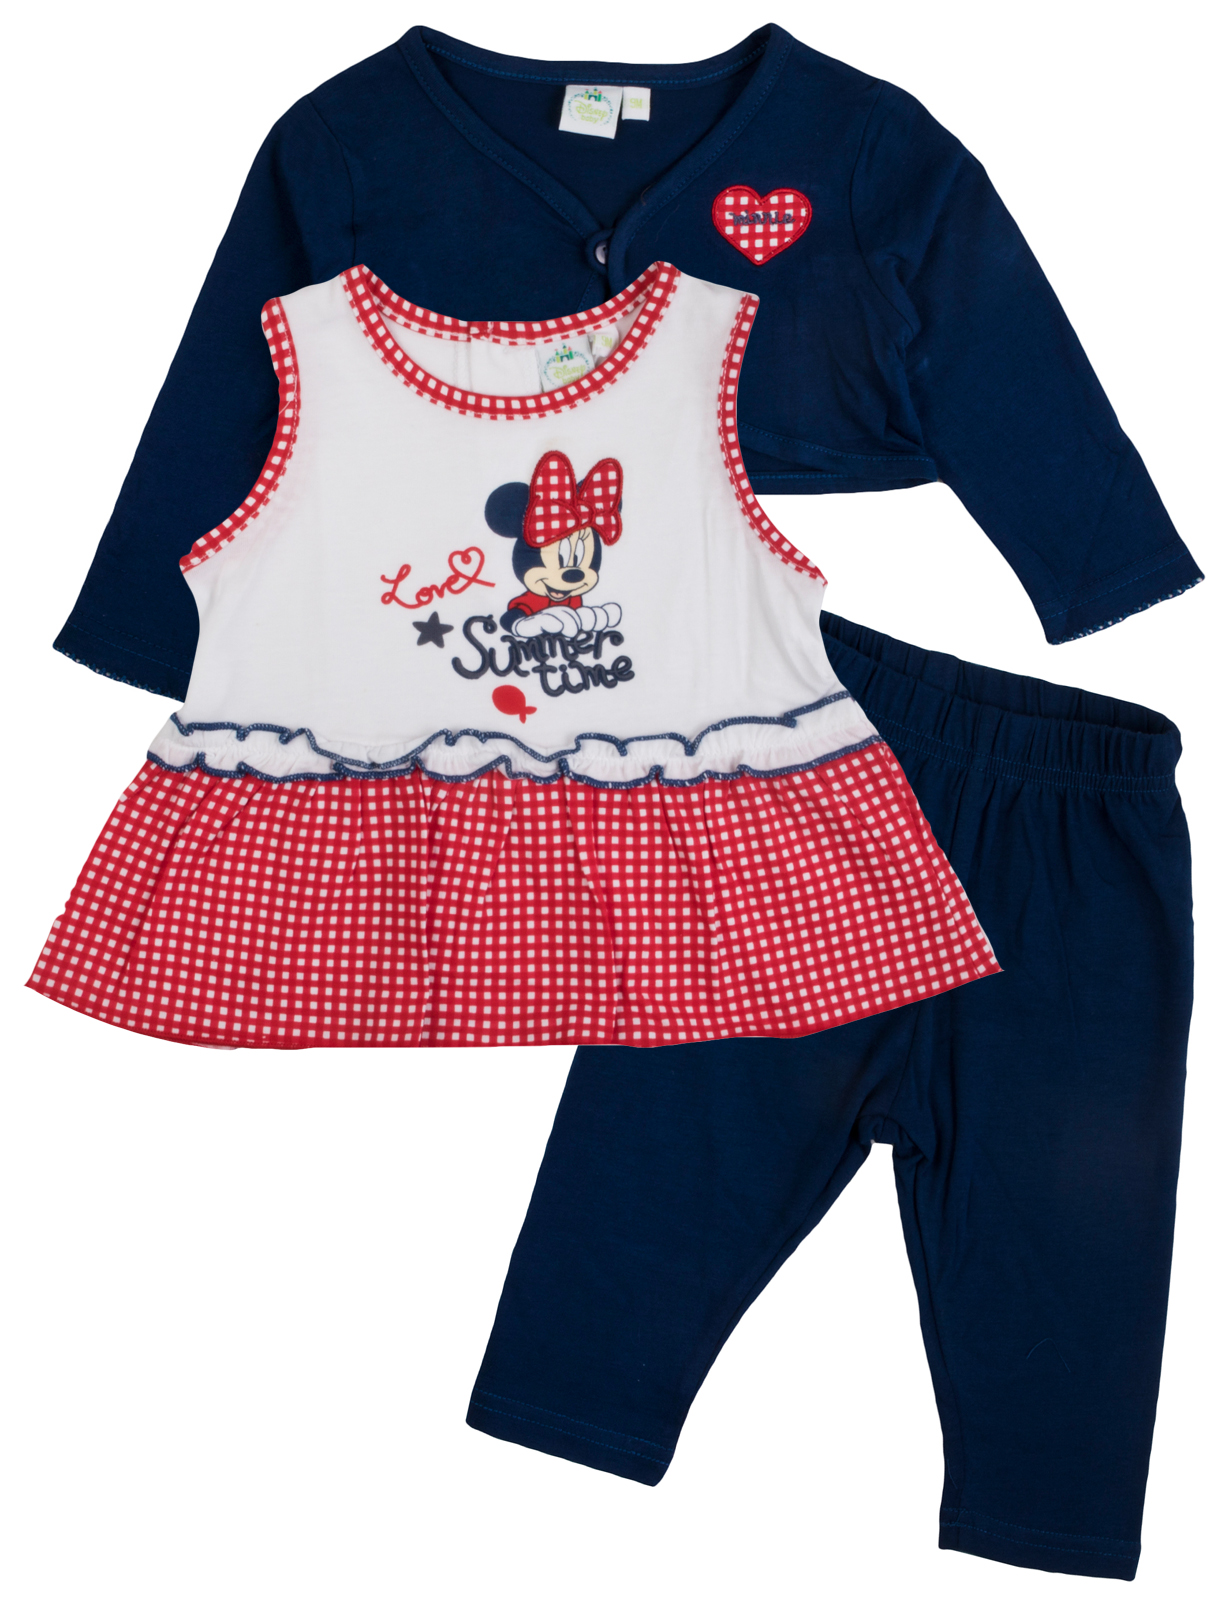 cfbbe2134337 Disney Minnie Mouse Outfit 3 Piece Set Dress Leggings + Cardigan ...